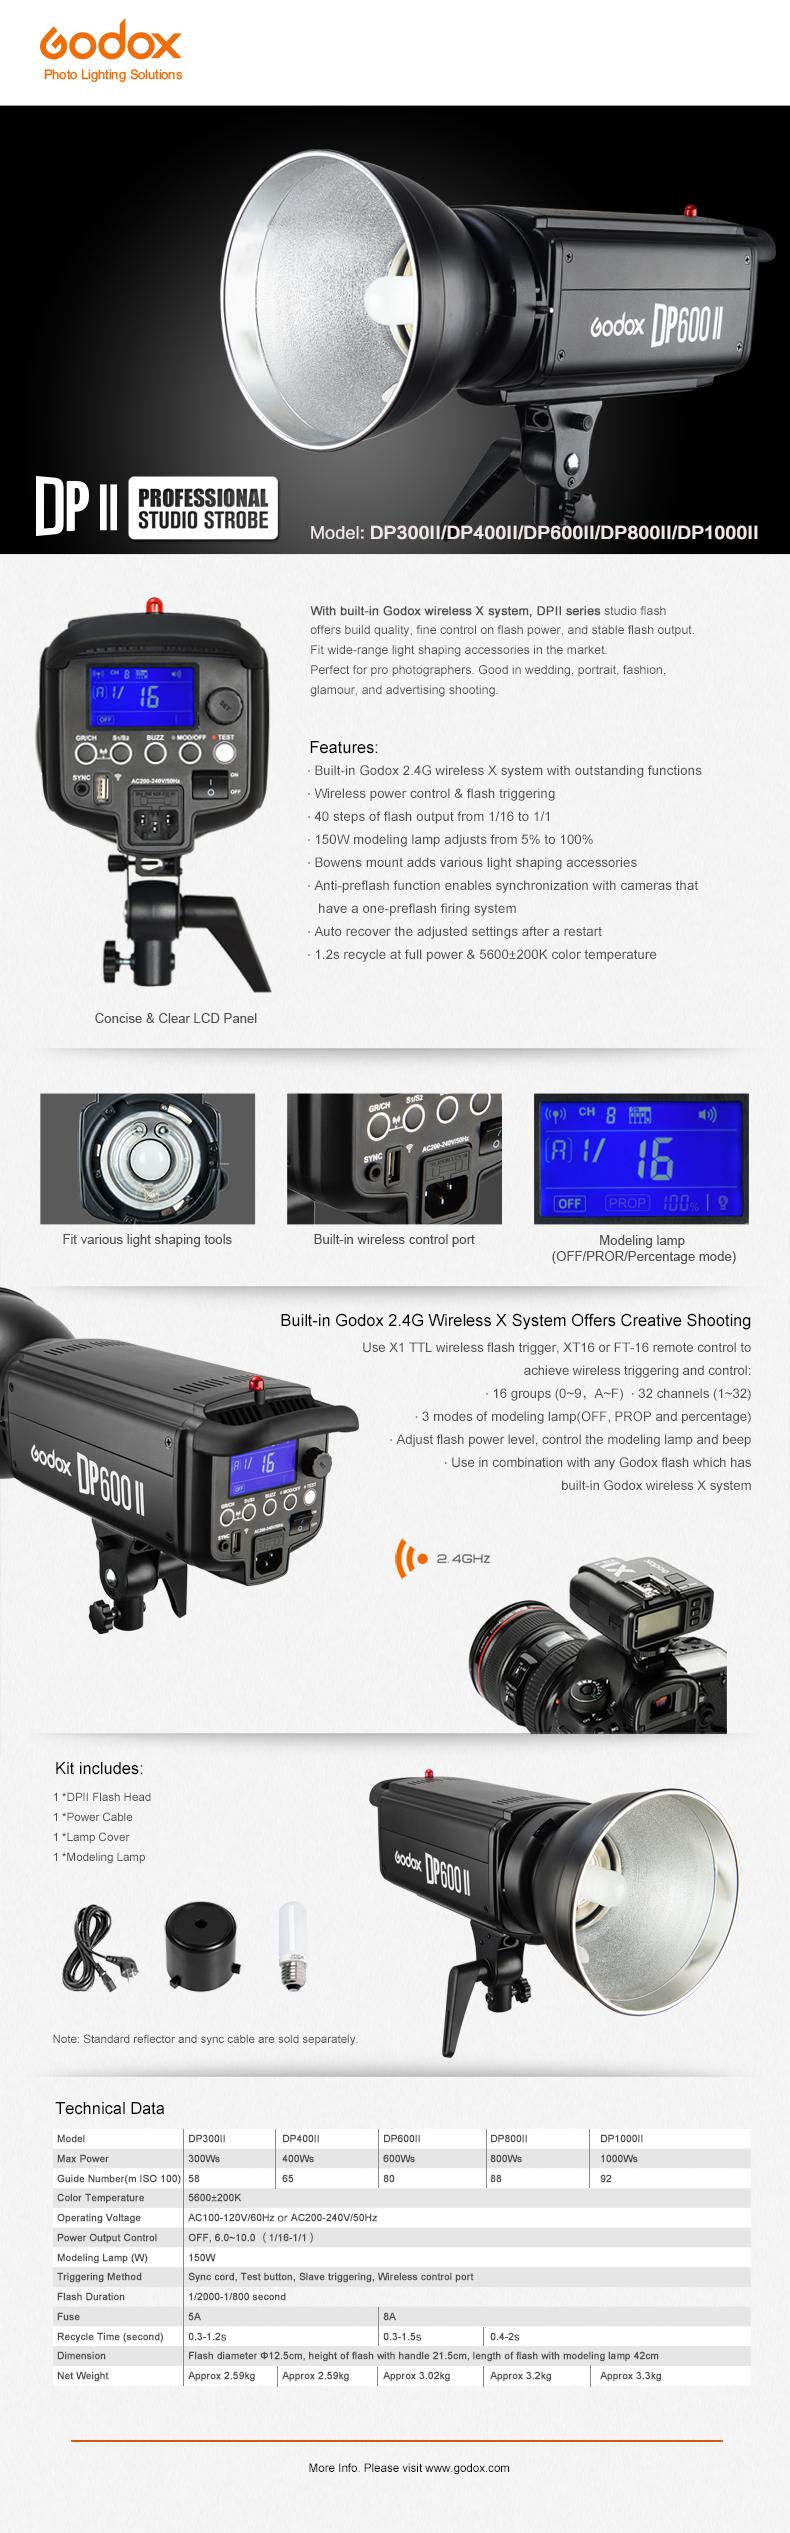 Godox Studio Flash DP600II Built-in with 2.4G X System (15)